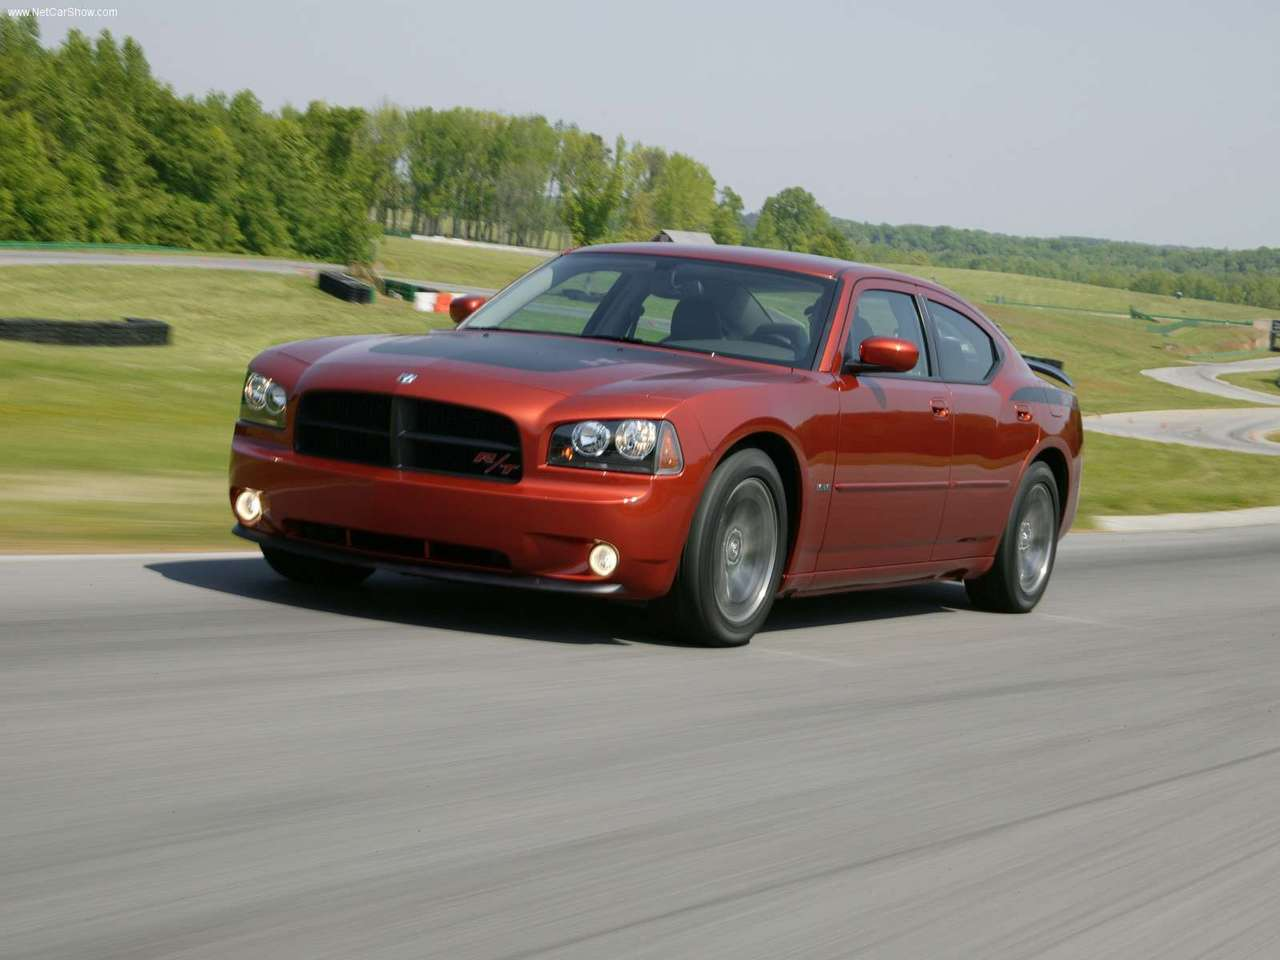 http://2.bp.blogspot.com/-9aPzzis-gTU/TXN_OGv41BI/AAAAAAAADTU/V-NI0df6BH8/s1600/Dodge-Charger_Daytona_RT_2006_1280x960_wallpaper_05.jpg